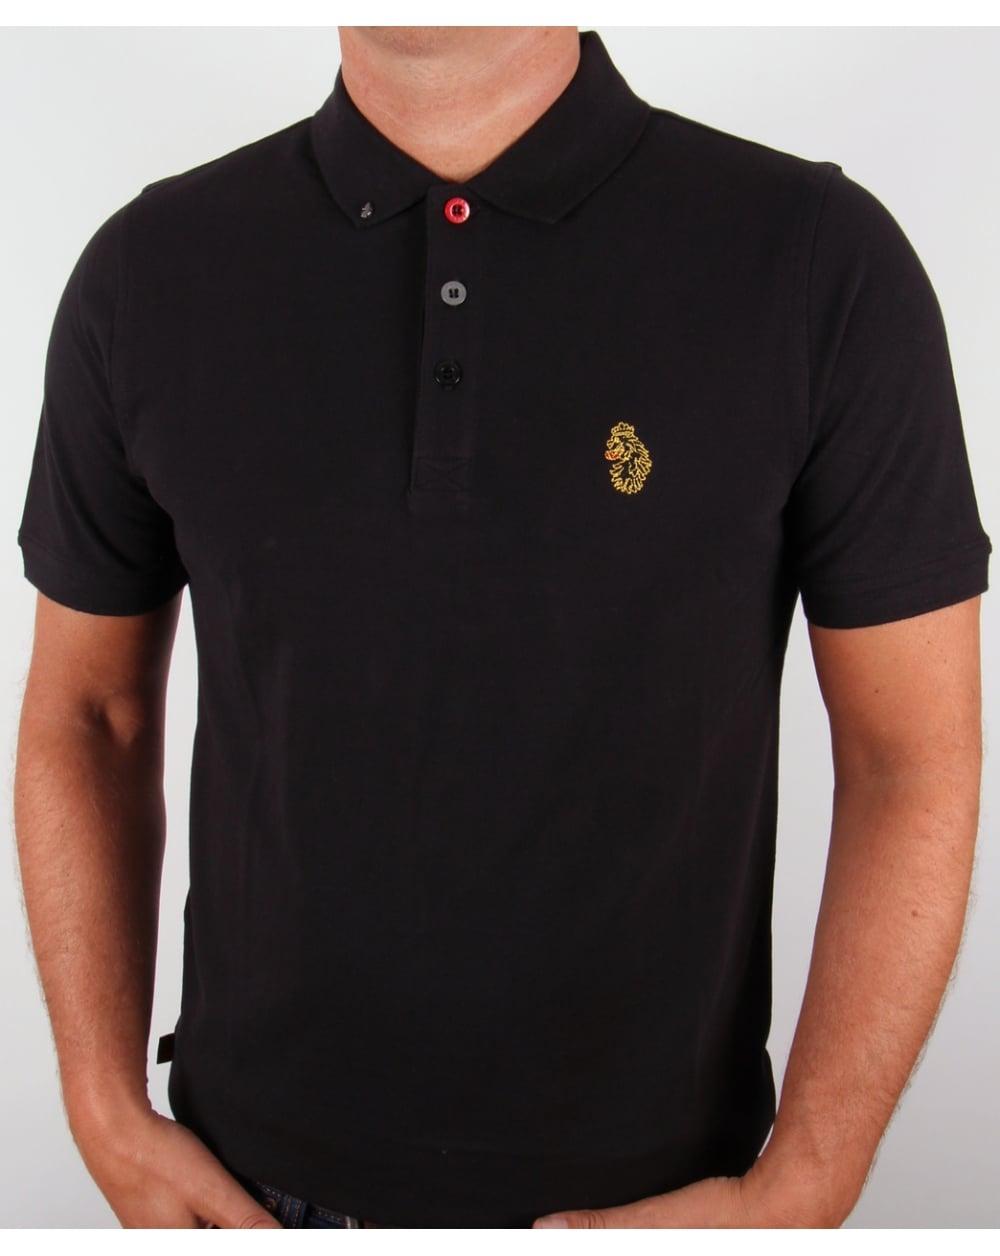 Luke Williams Polo Shirt Black Cotton Mens Smart